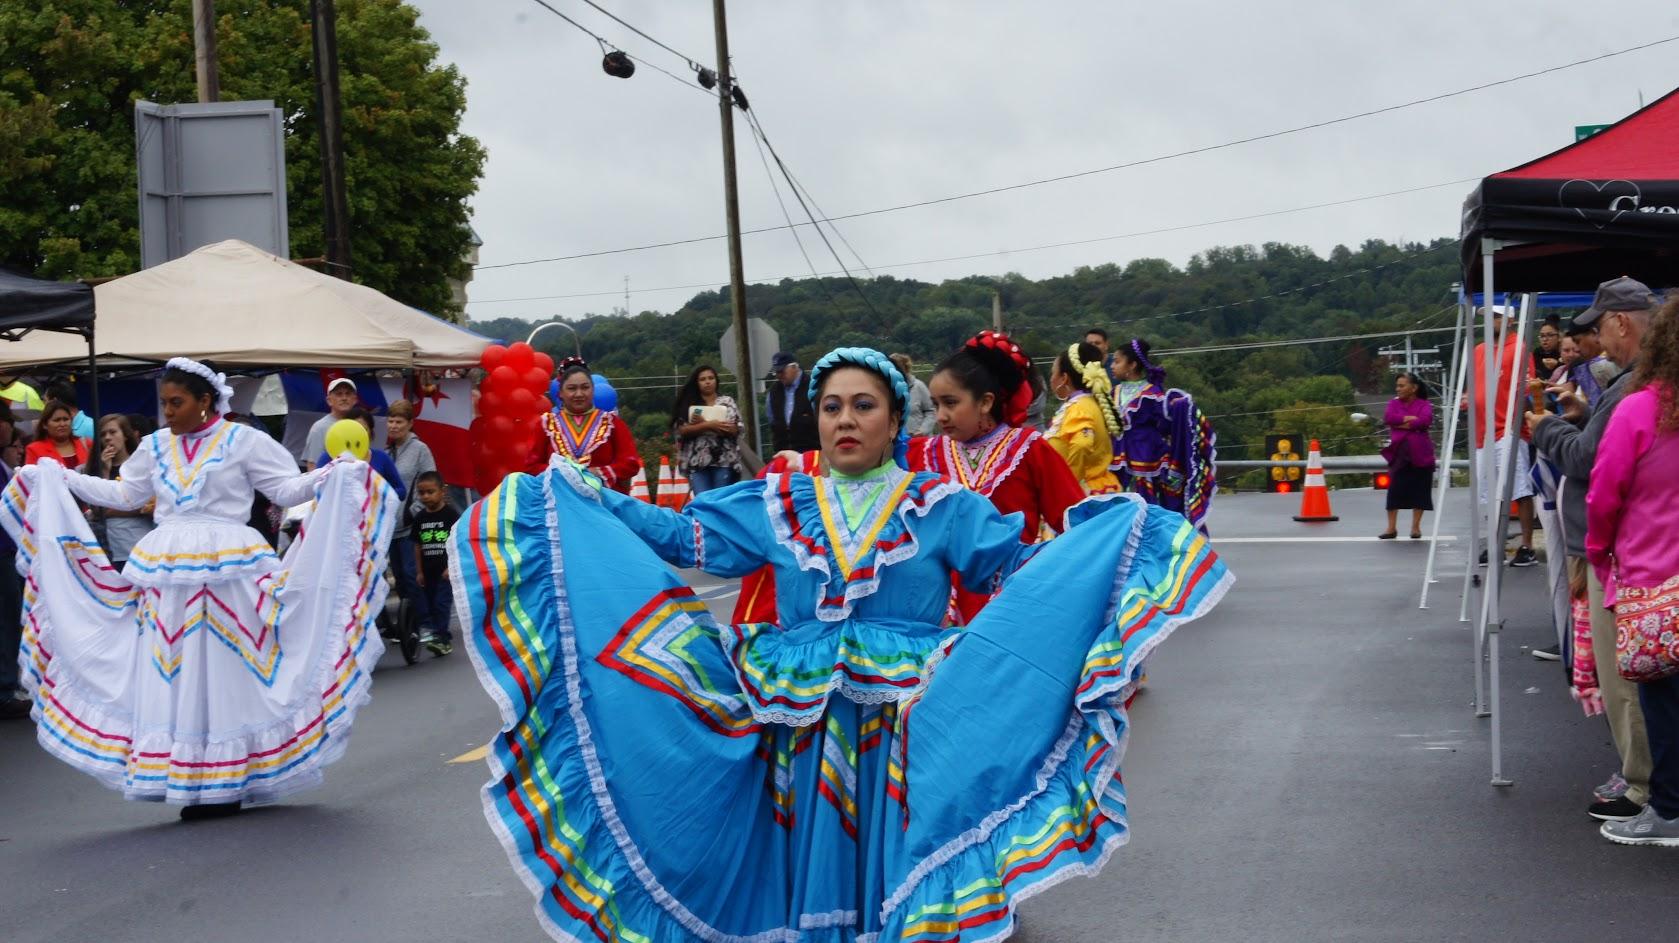 HOLA Lakeway International Food Festival